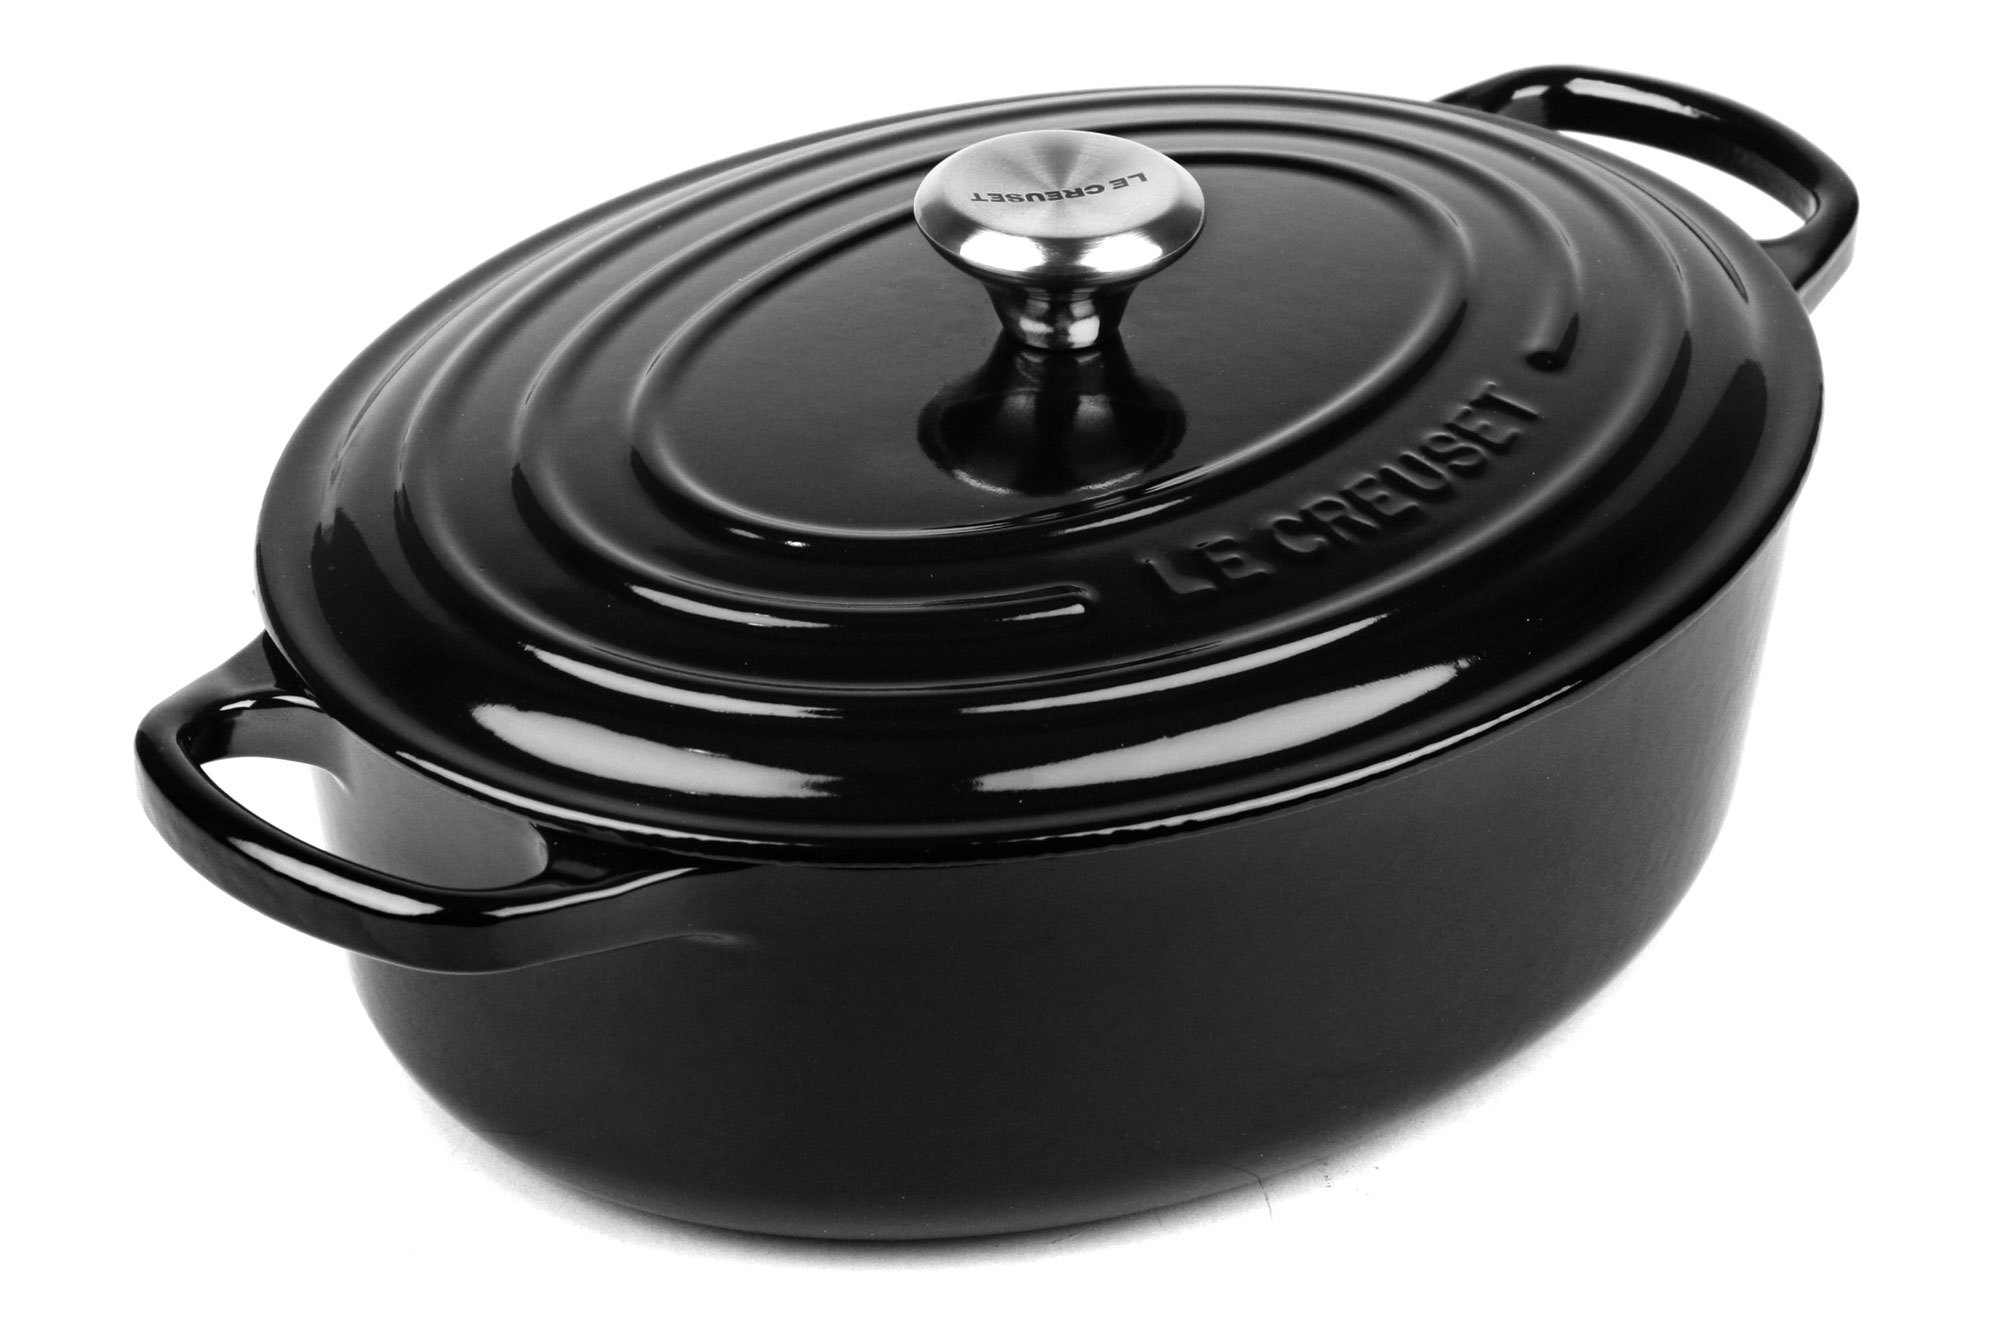 Le Creuset Signature Cast Iron Oval Wide Dutch Oven 3 5